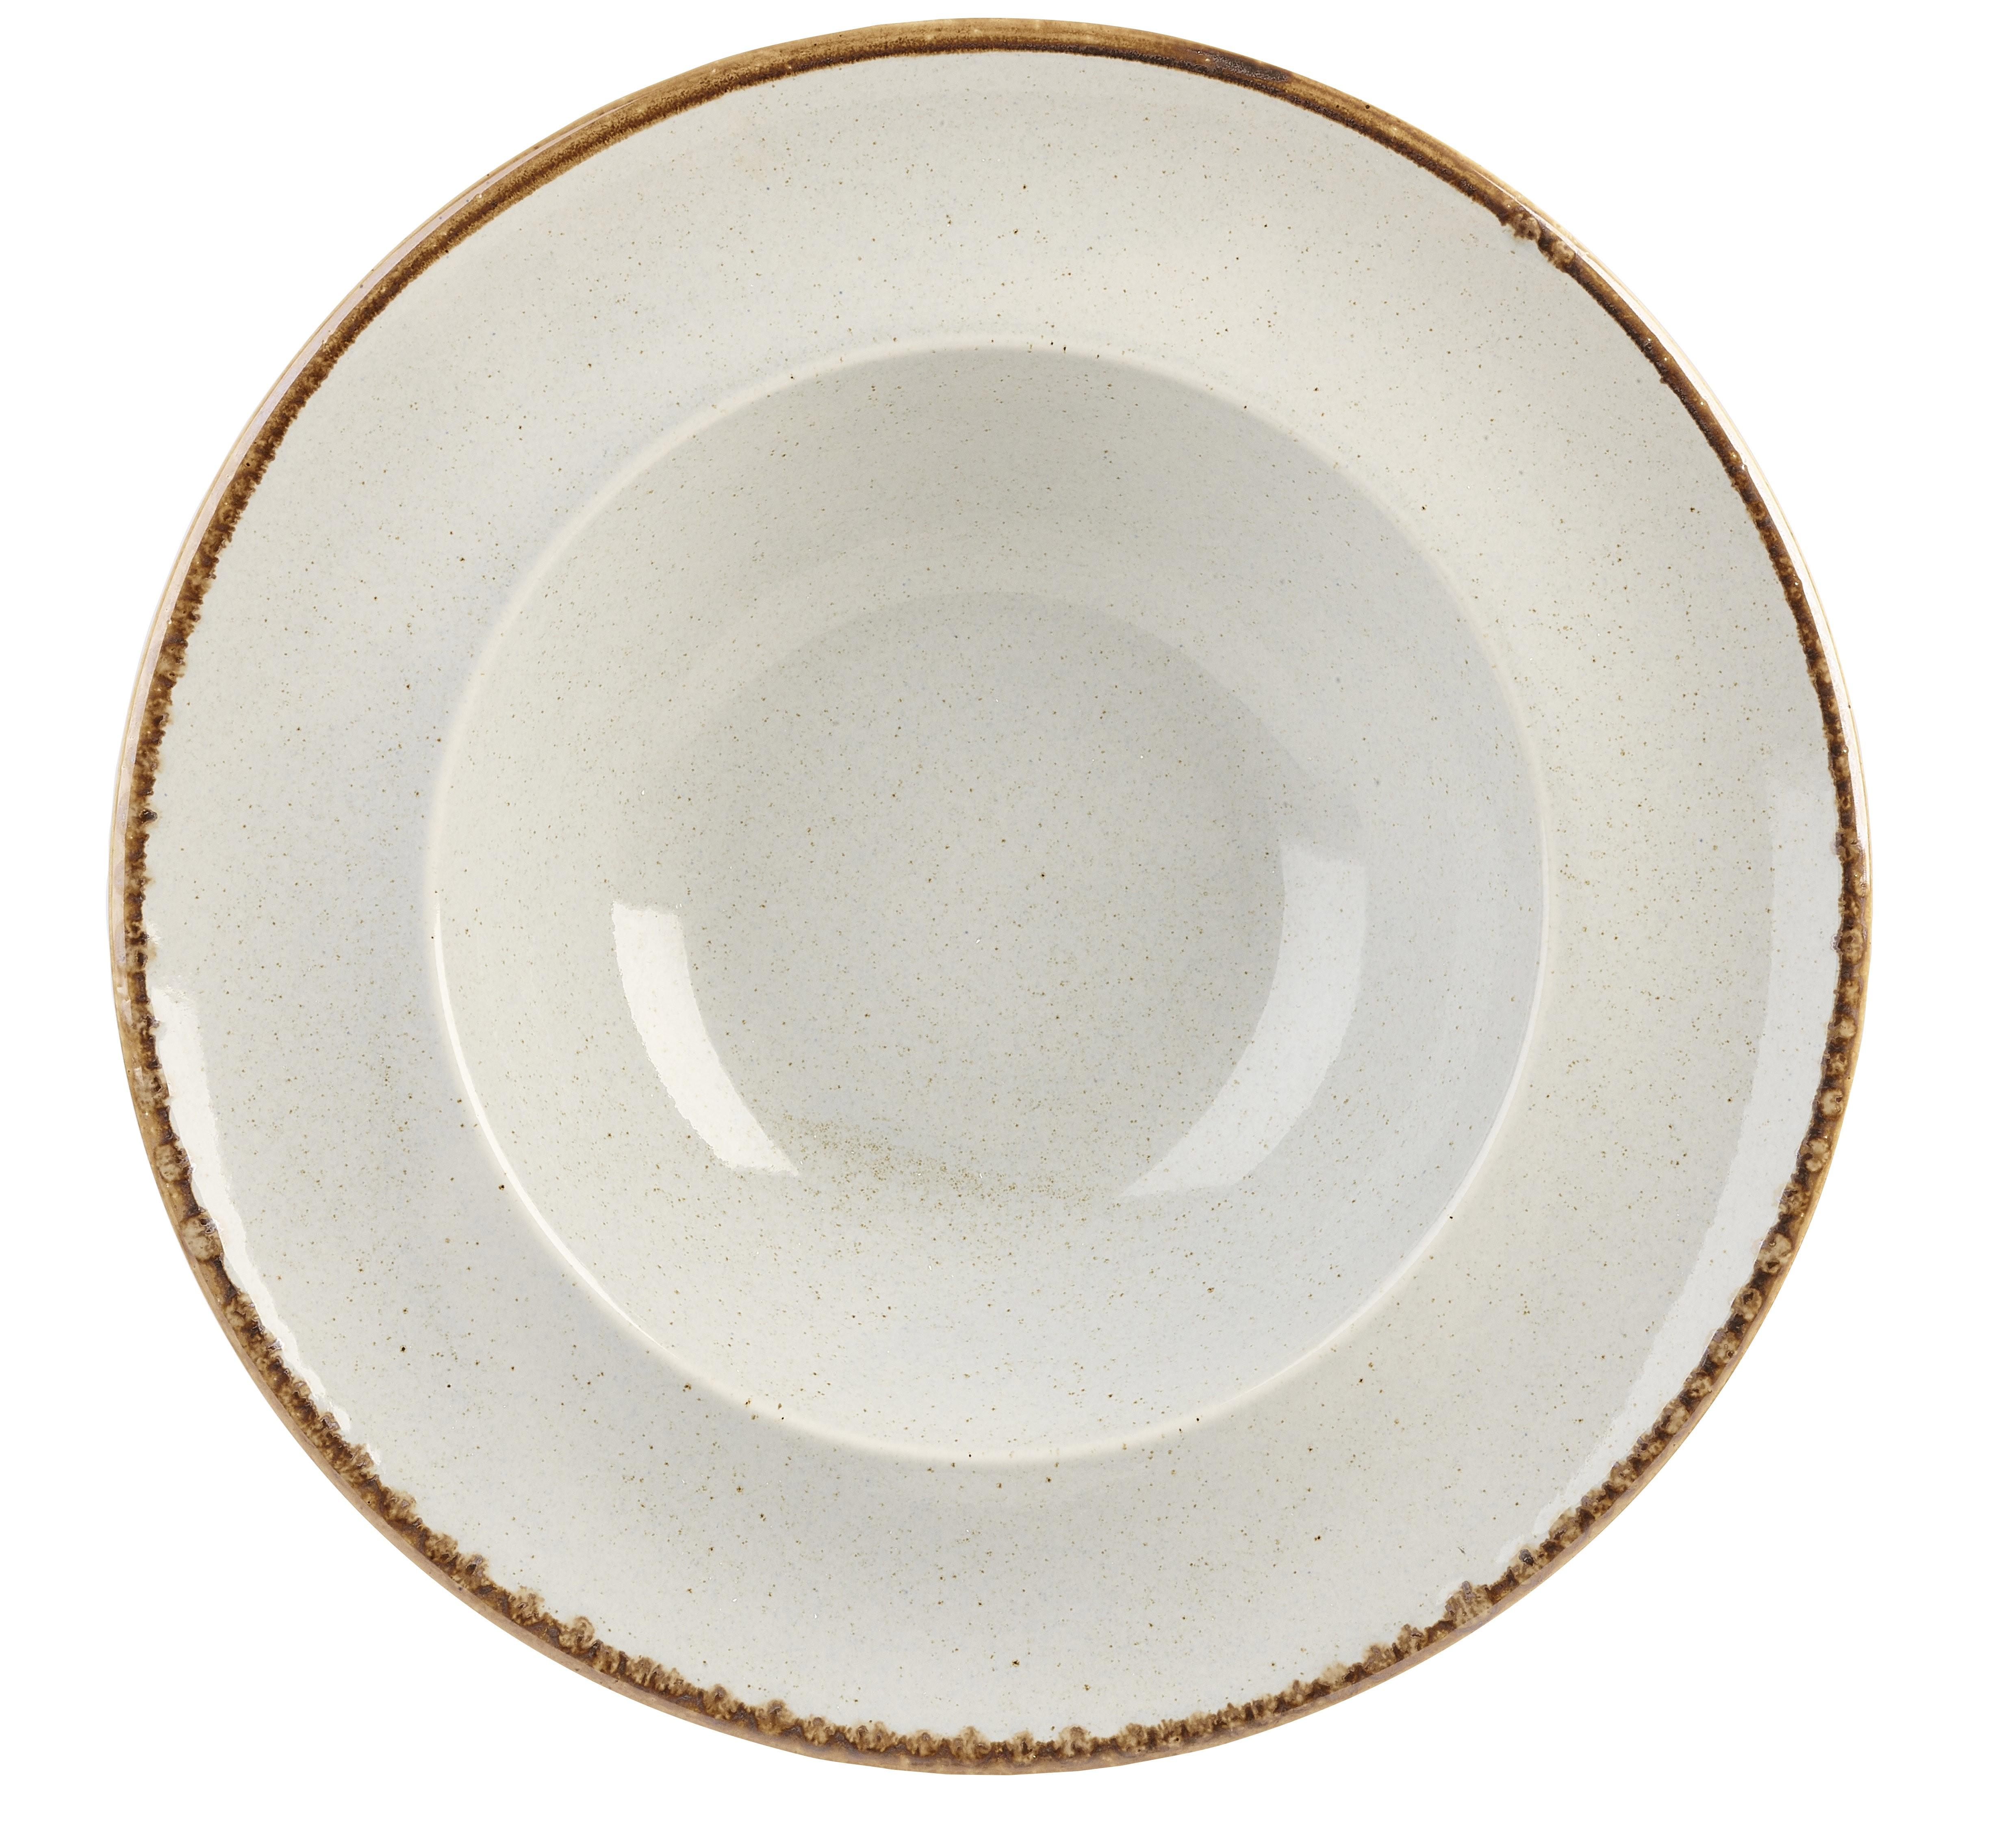 Pasta Piedra 26cm Plate